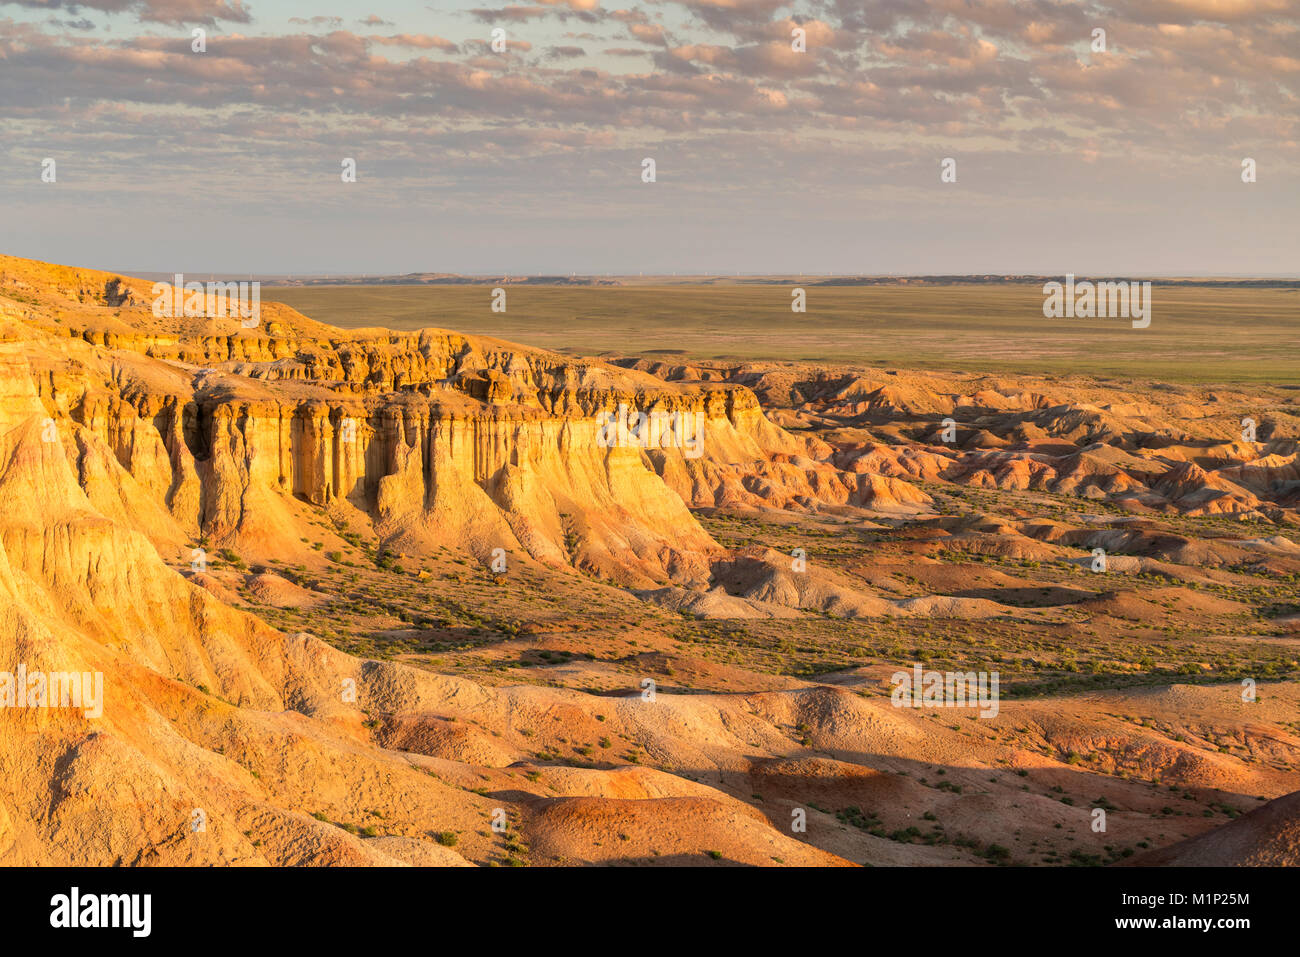 Estupa blanca en la luz de la mañana, Ulziit Oriente, provincia de Gobi, Mongolia, Asia Central, África Imagen De Stock